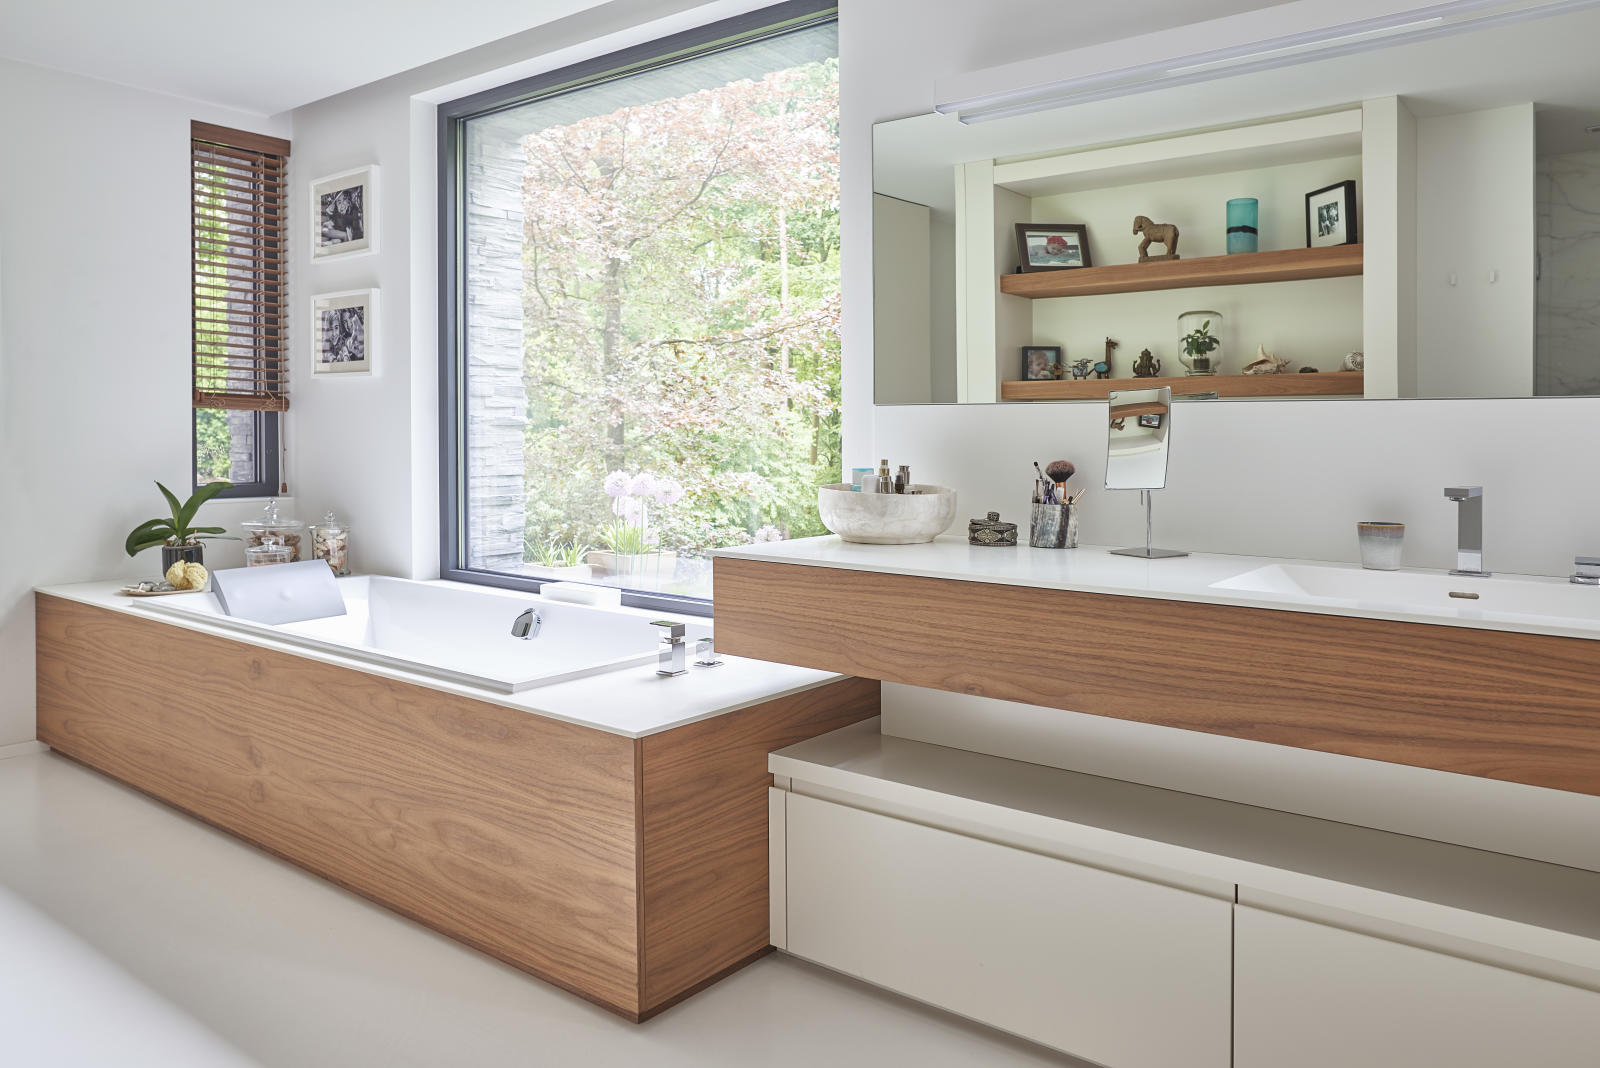 Badkamer Showroom Brabant : Badkamers la menuiserie du brabant